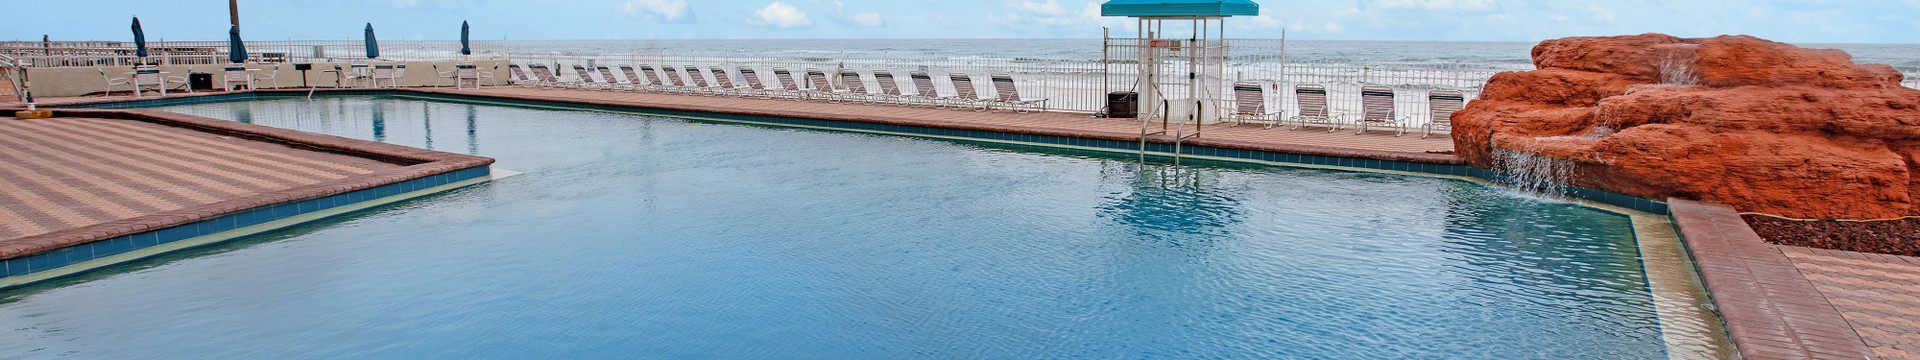 Daytona Beach Vacation Accommodations Rooms at Harbour Beach Resort